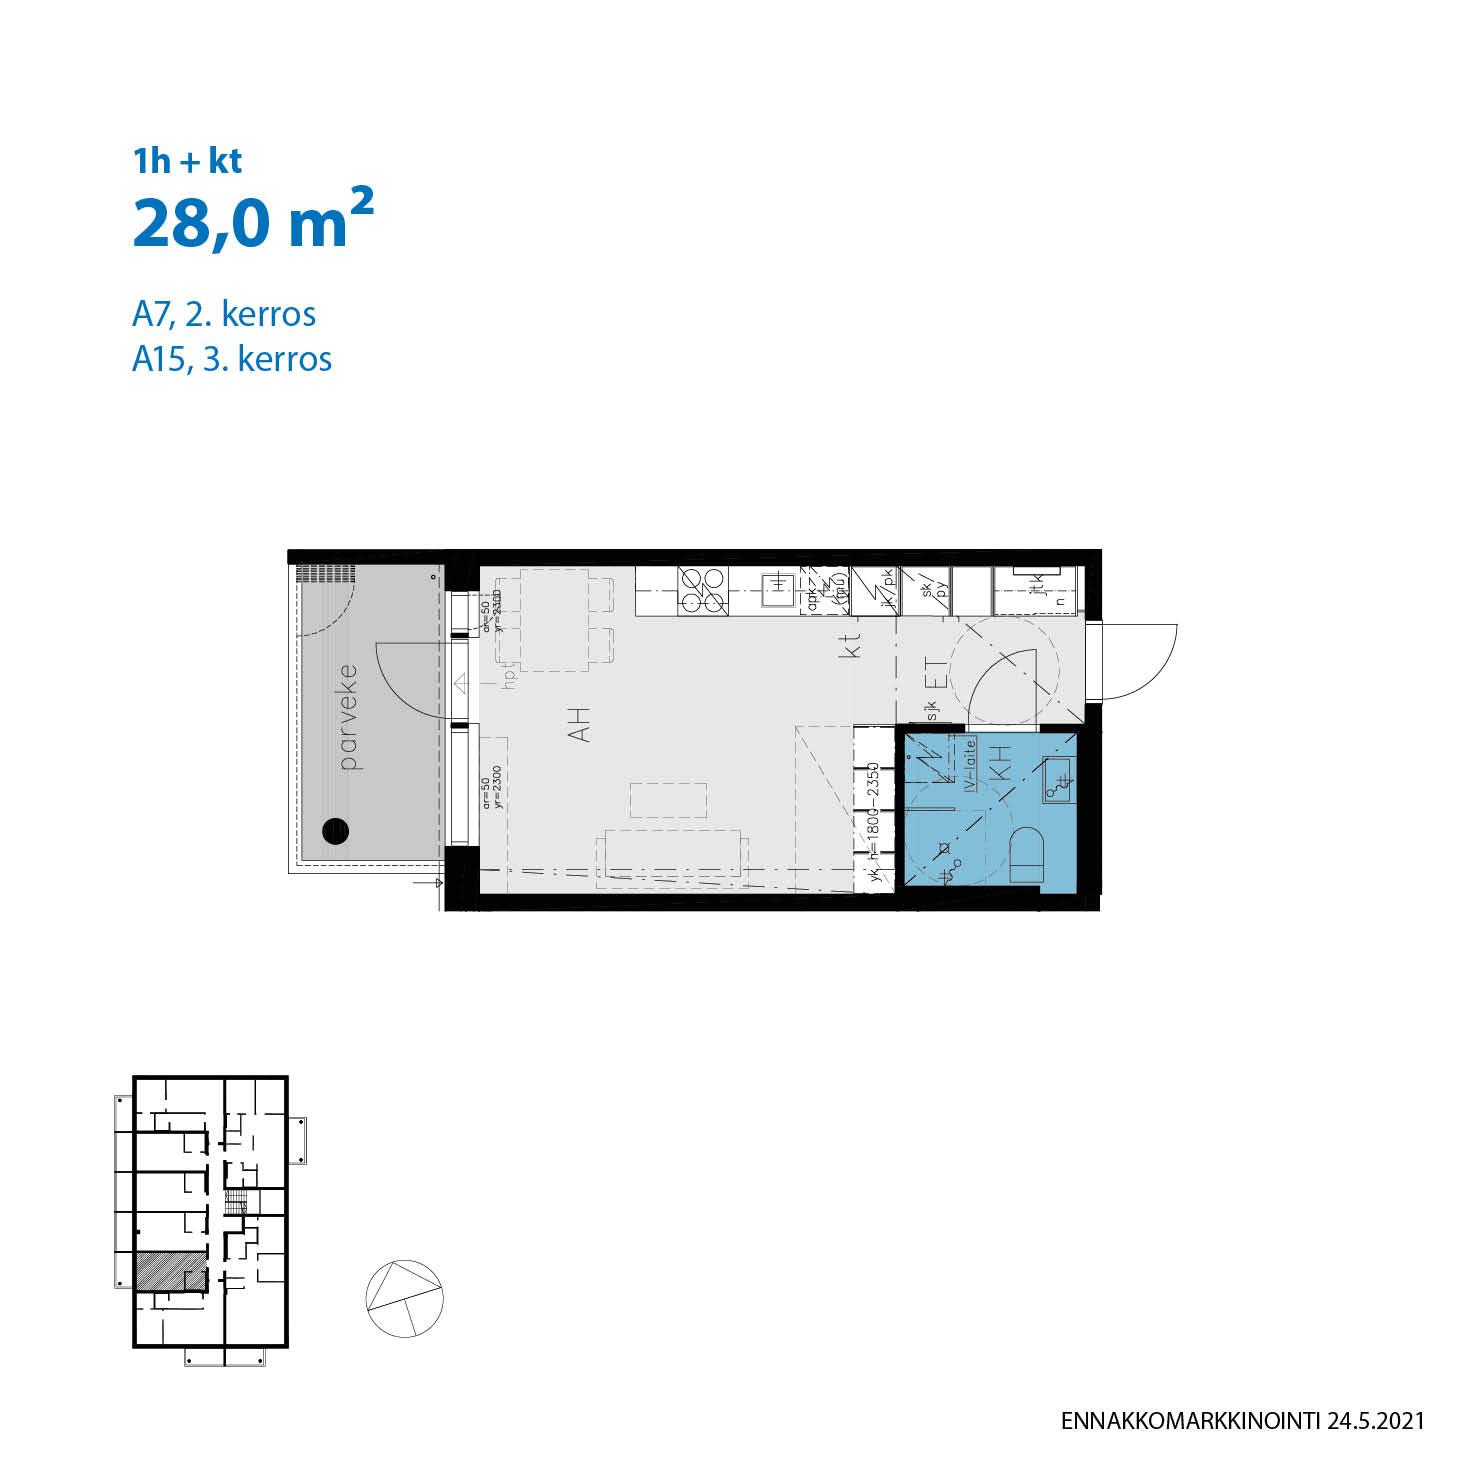 A7, 28.0 m<sup>2</sup>, 1h+kt